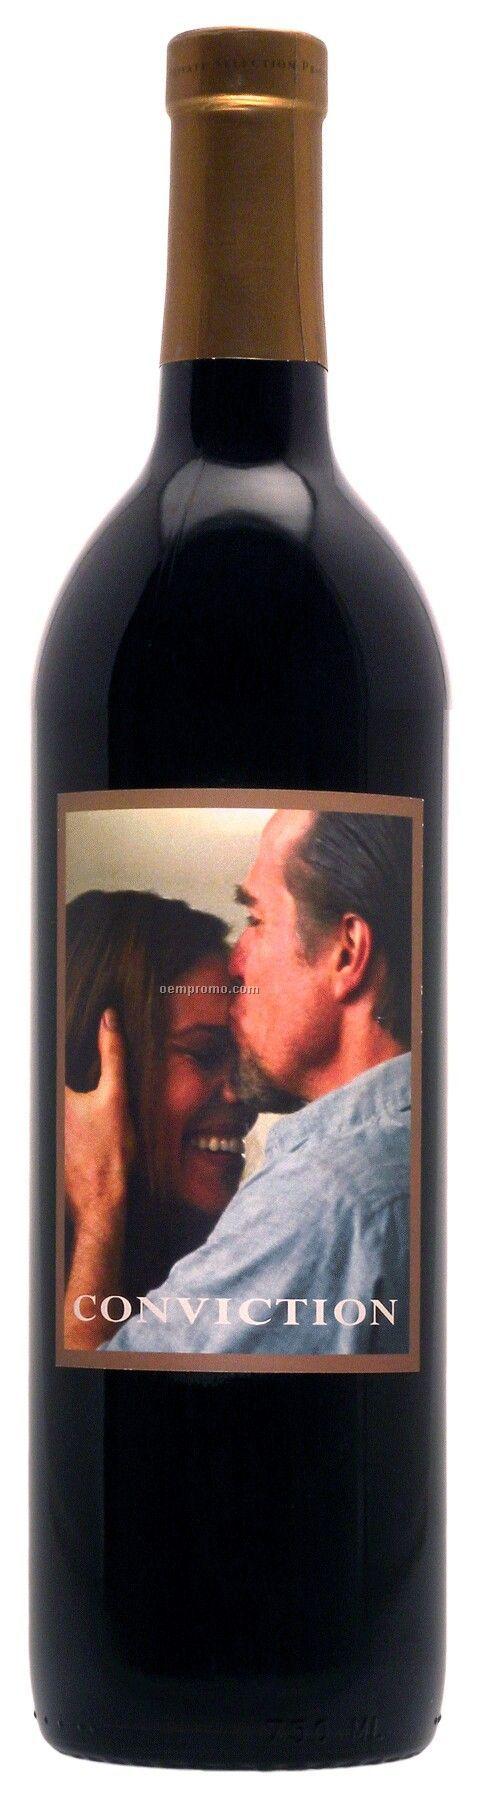 750ml Standard Merlot Wine With Label